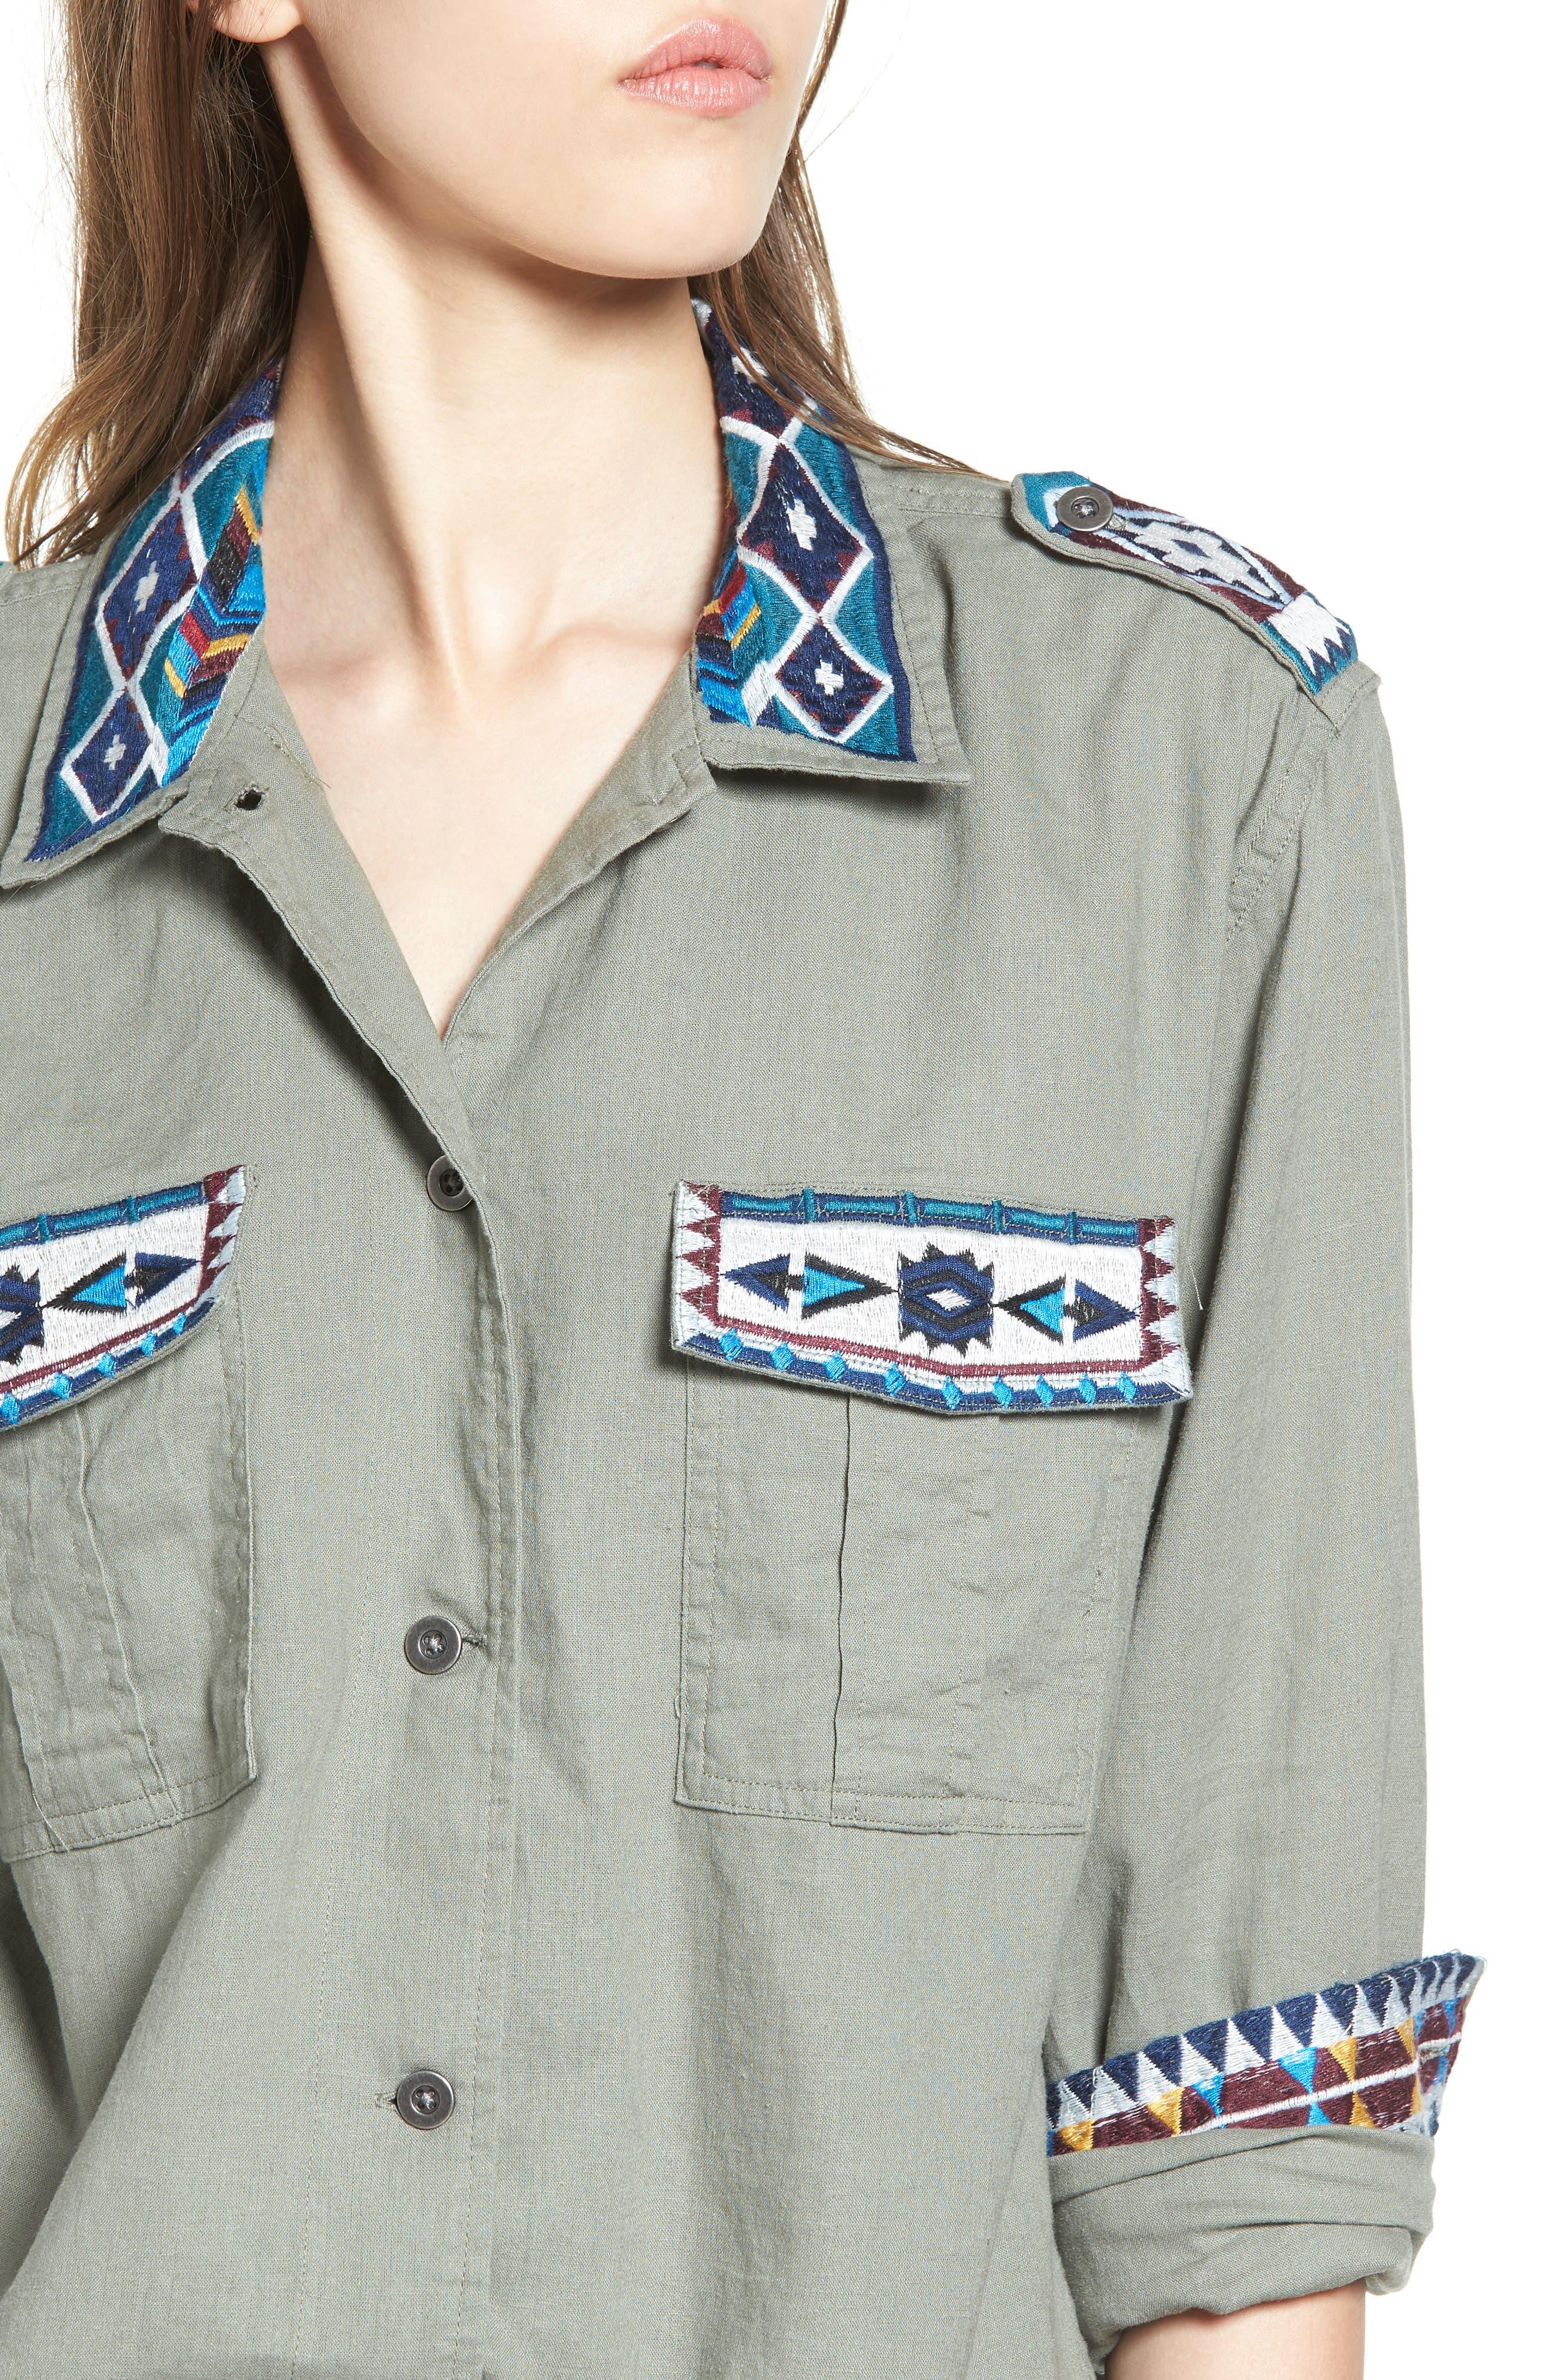 Kona Embroidered Shirt,                             Alternate thumbnail 4, color,                             Sage/ Inca Embroidery